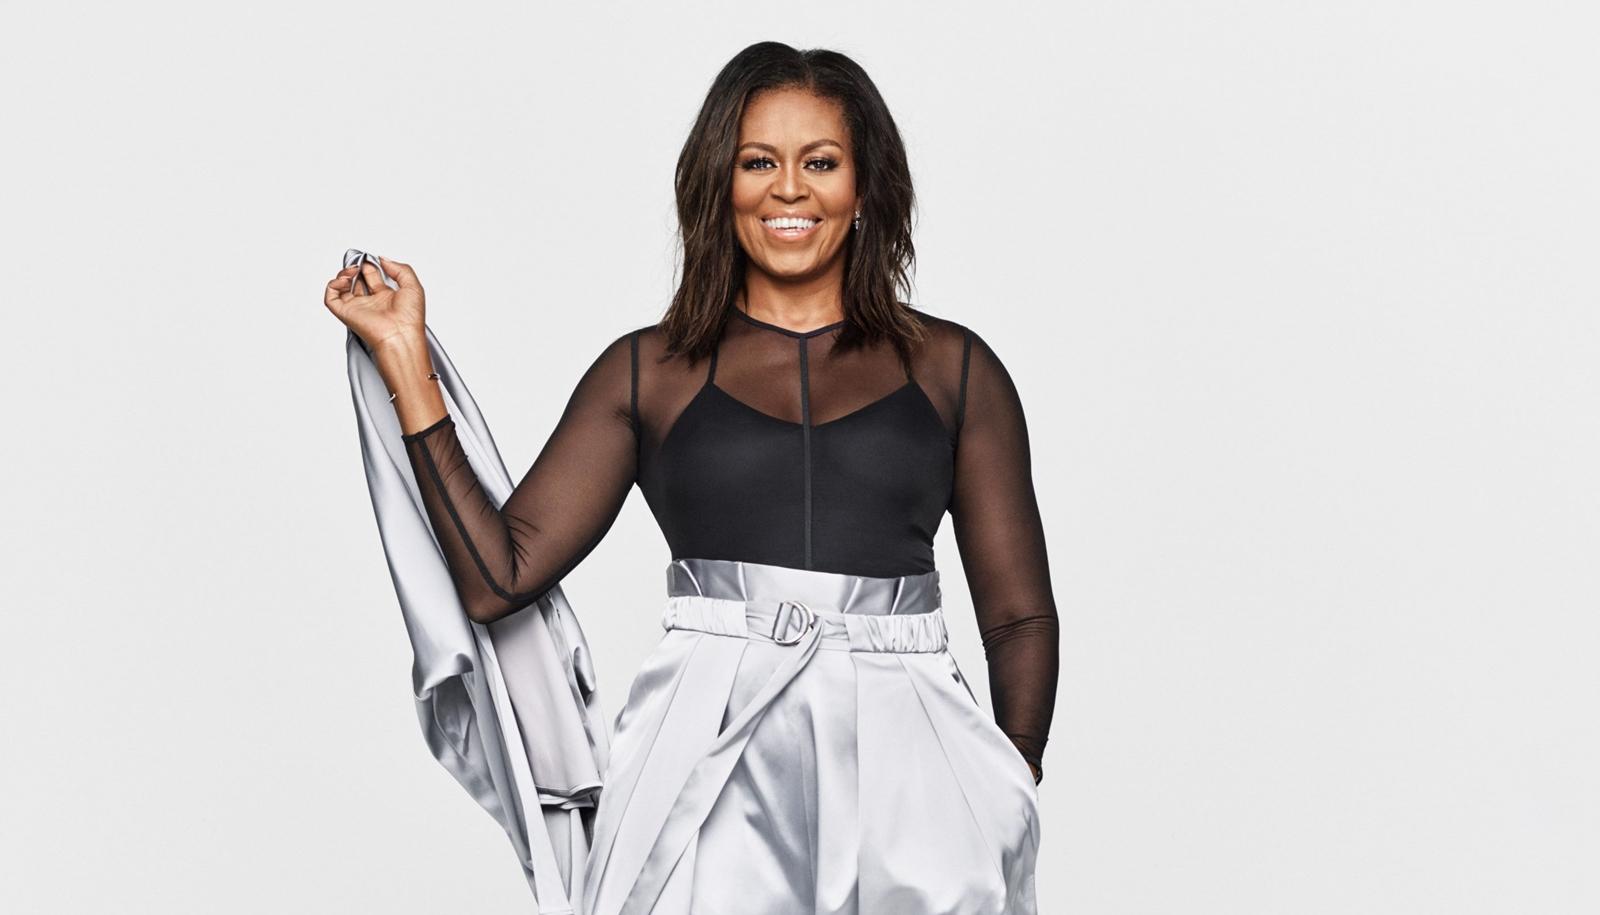 Las mejores frases de Michelle Obama para inspirarte.